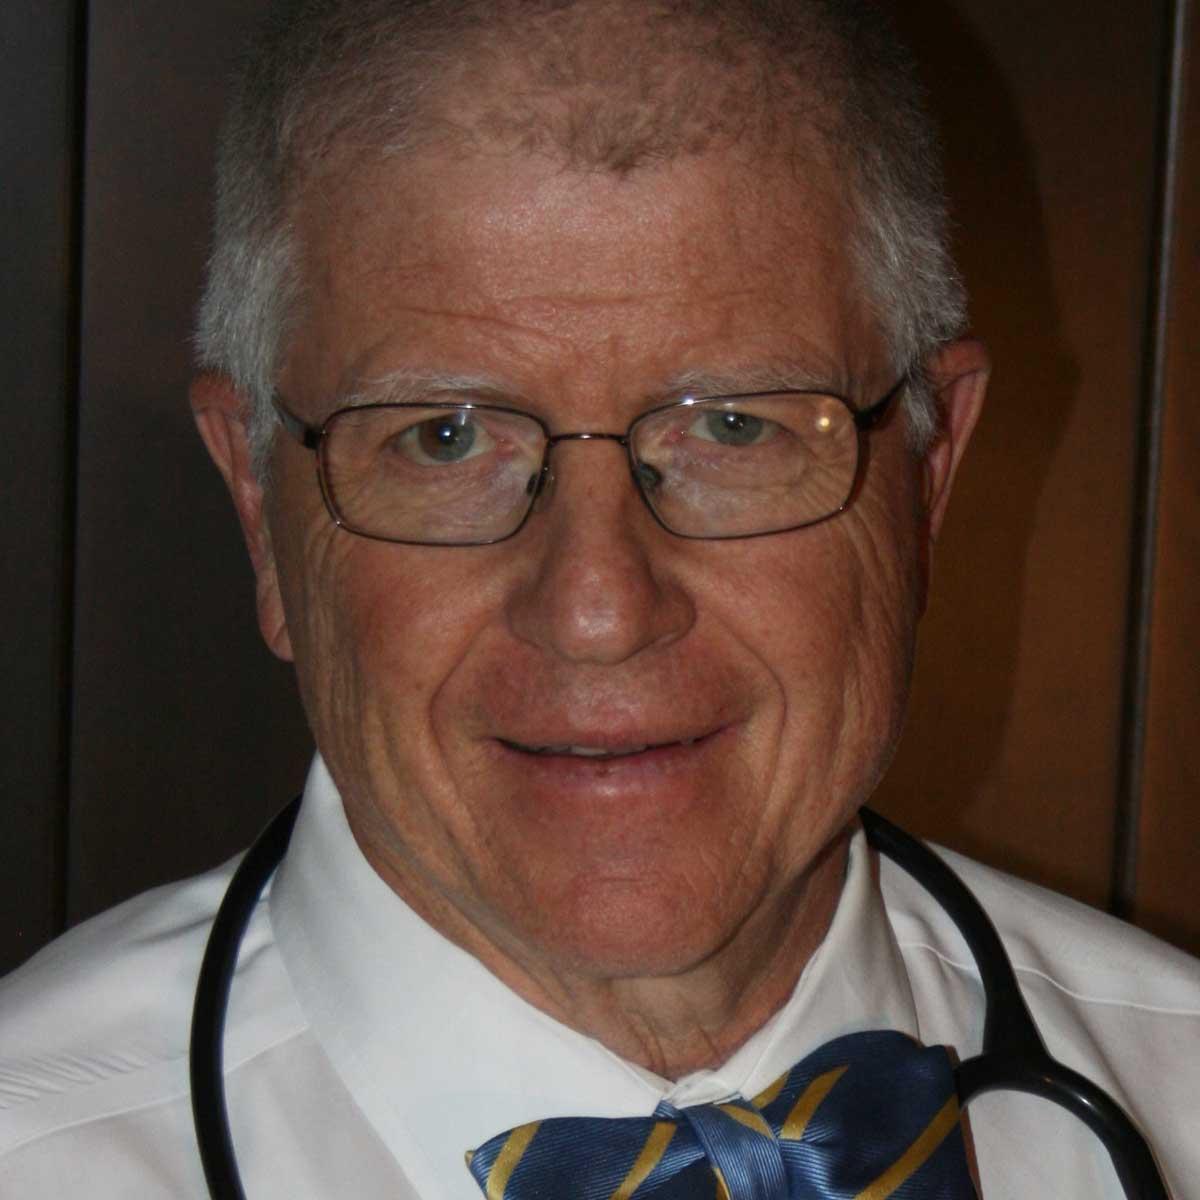 meet dr larew larew internal medicine concierge medicine